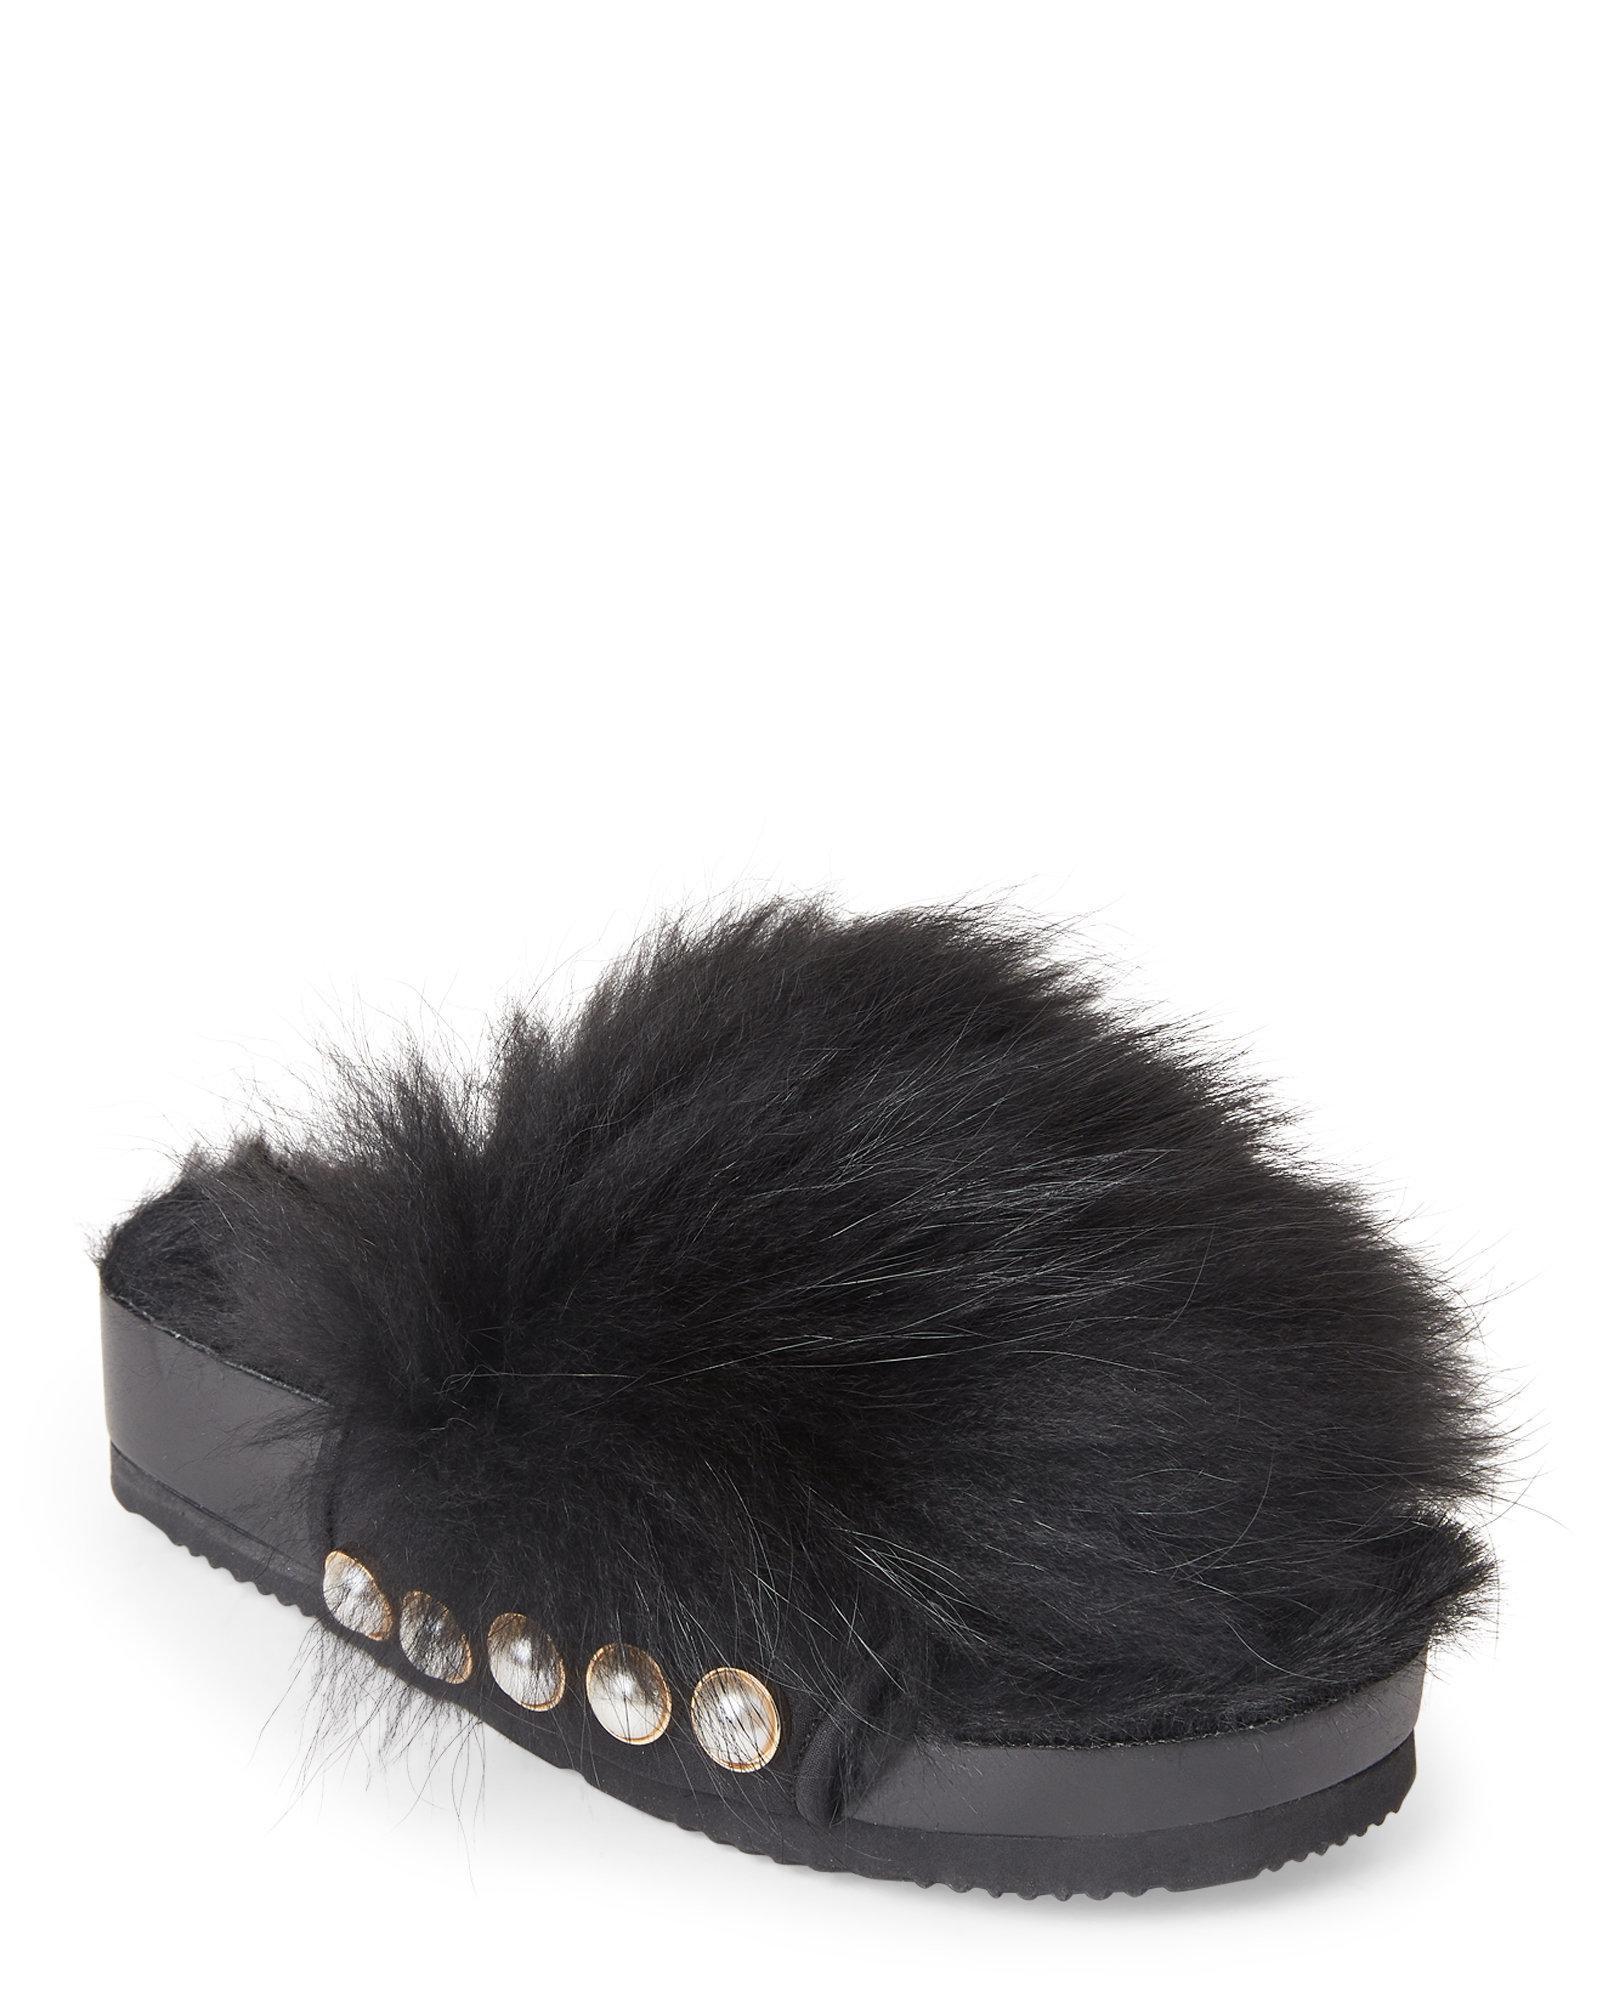 lyst suecomma bonnie black pearl embellished real fur slide